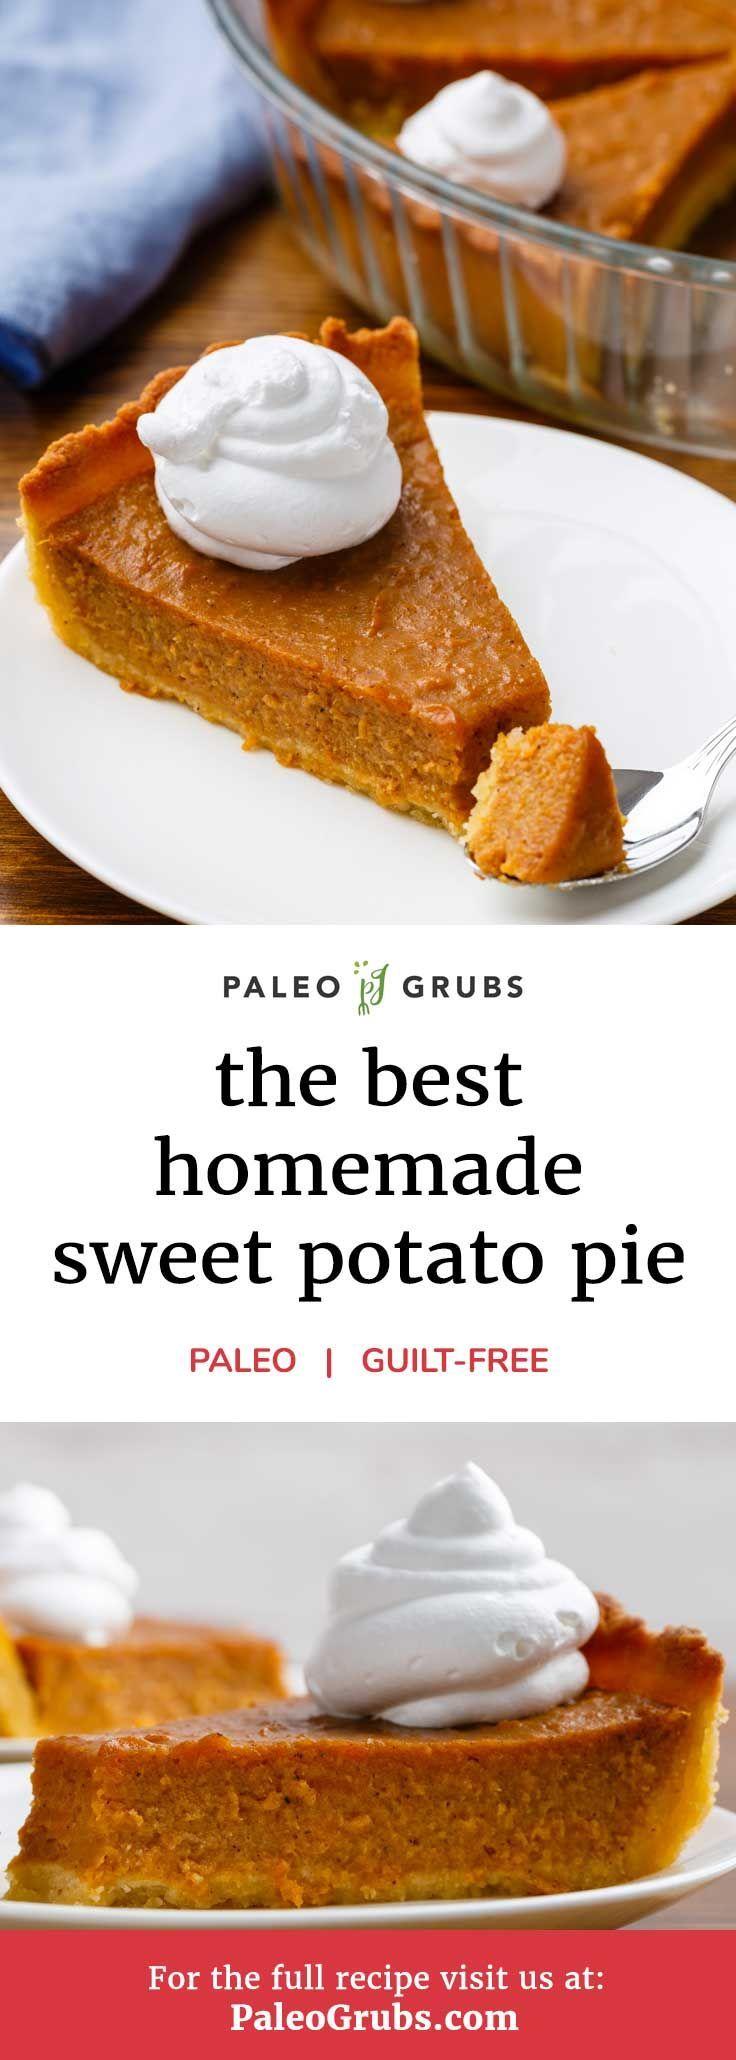 Paleo Sweet Potato Pie with an Almond Flour Crust